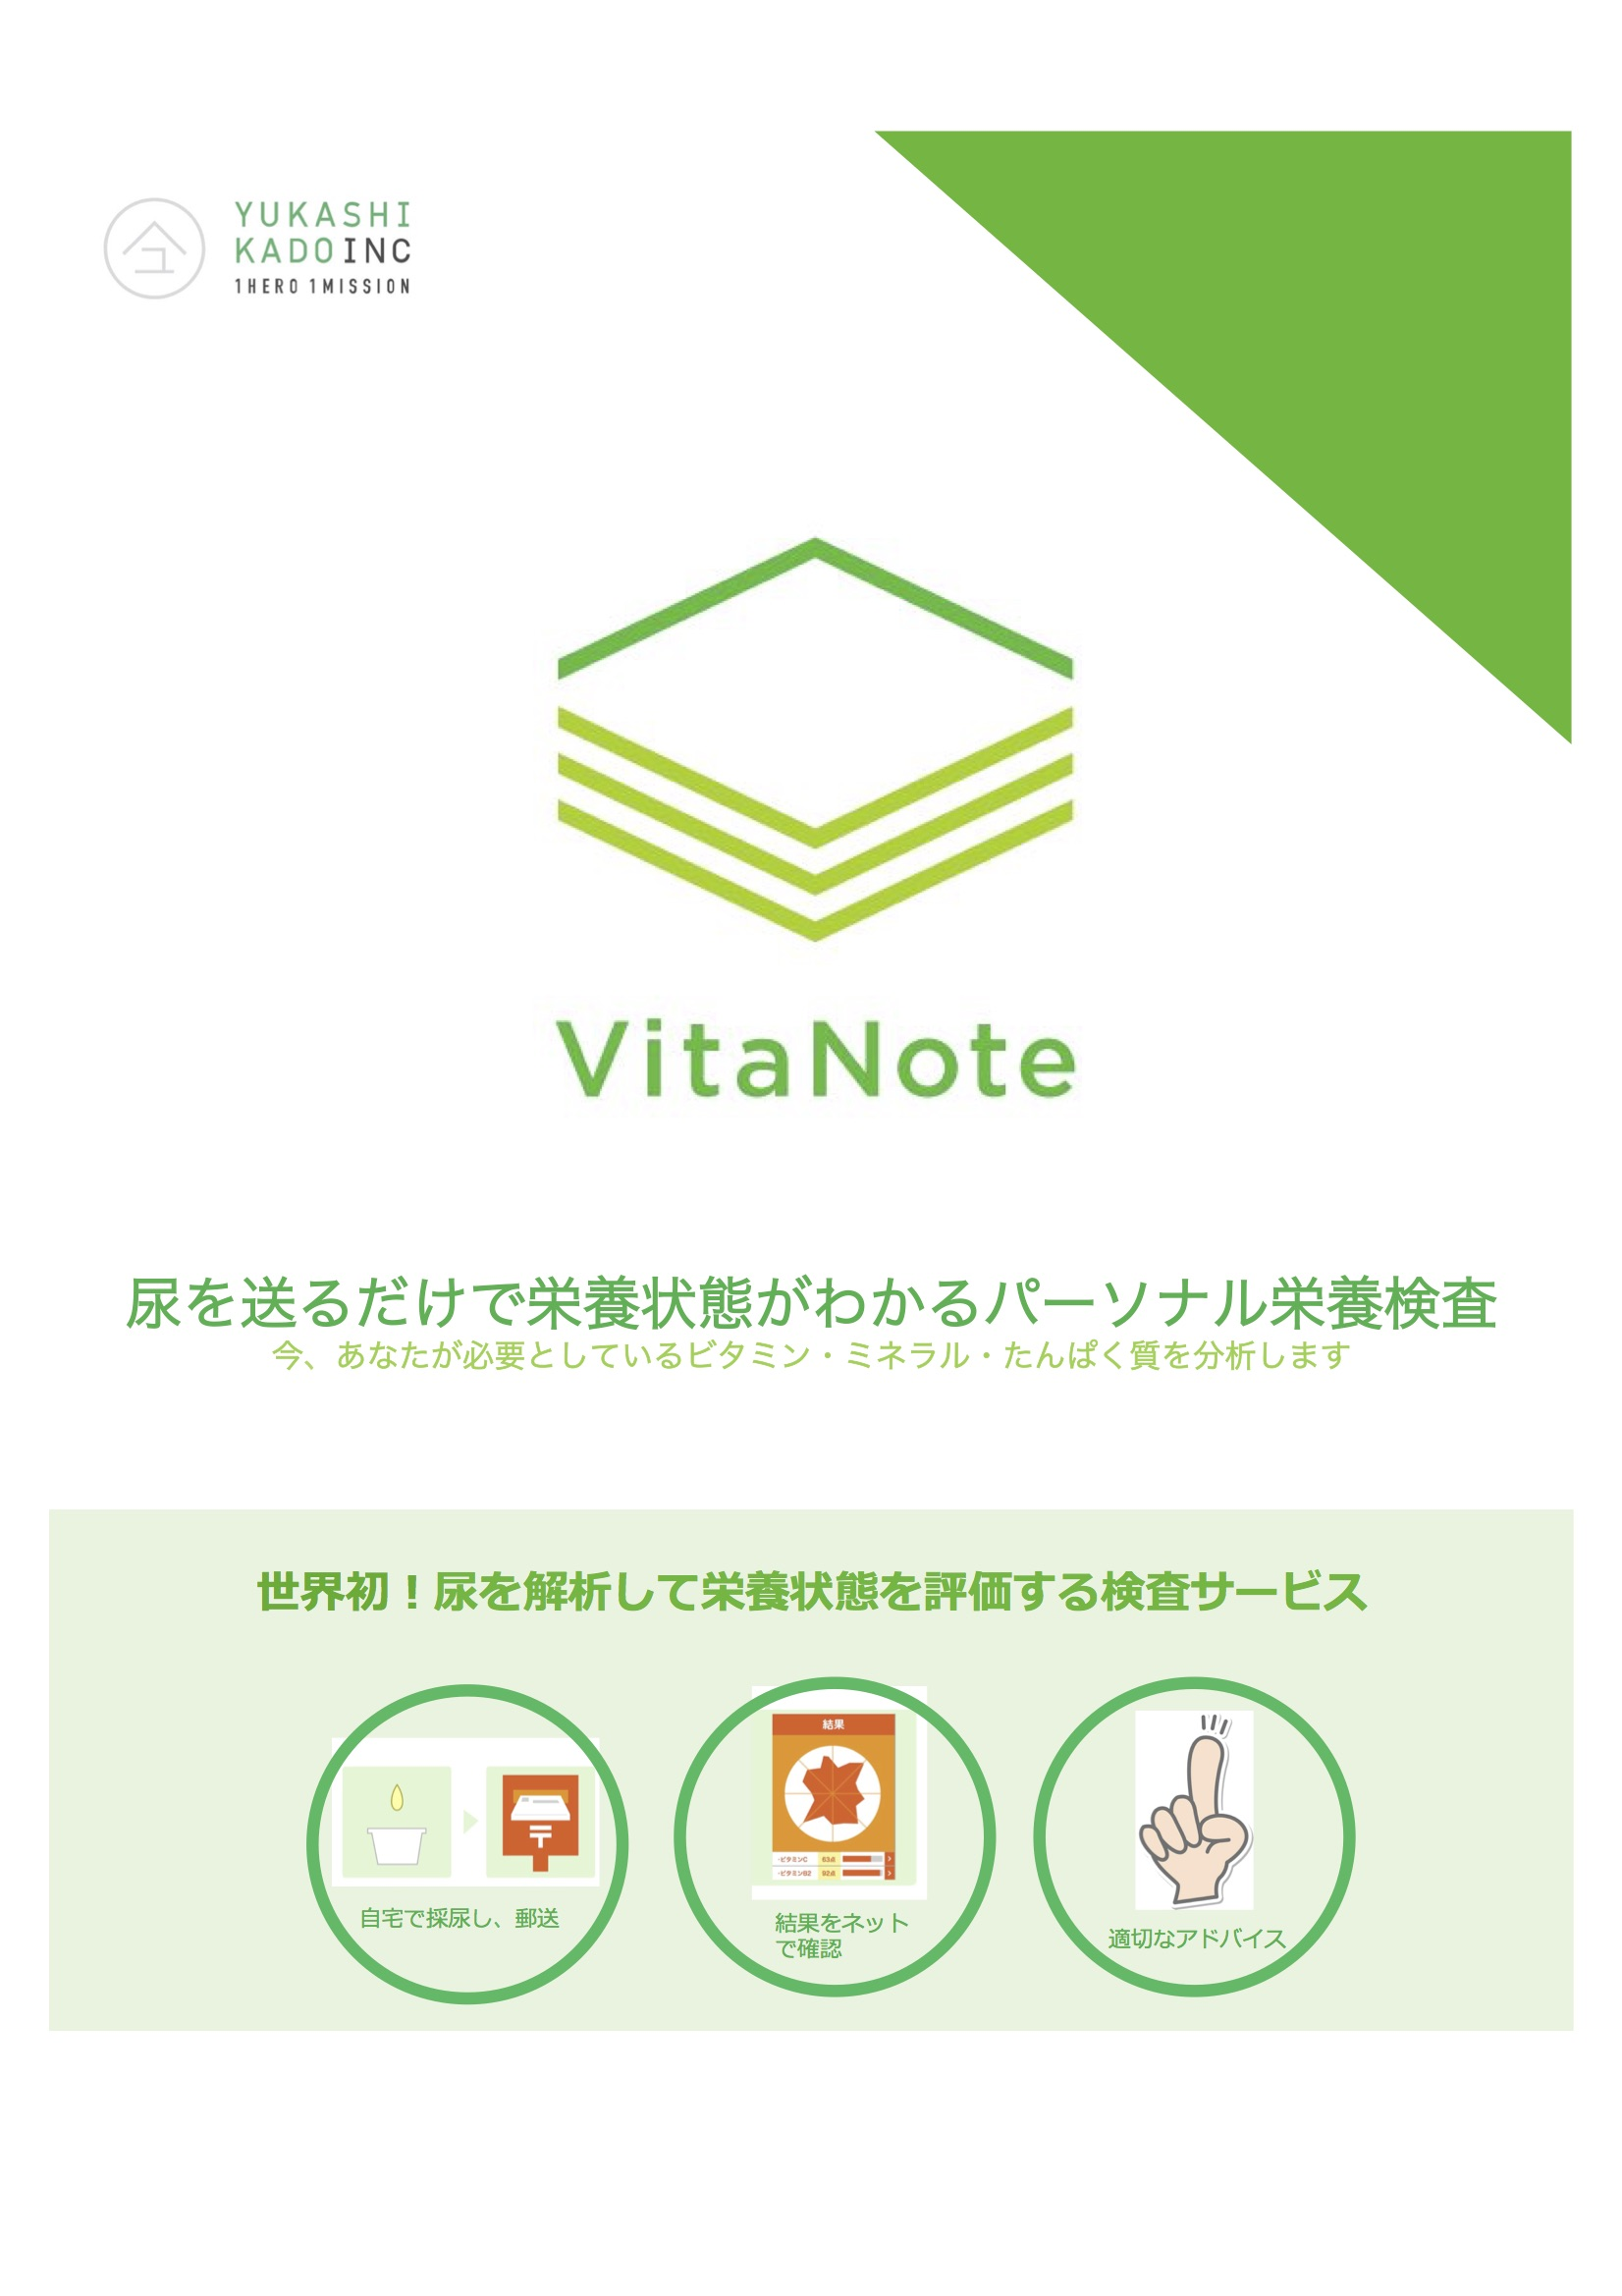 1,【VitaNote】説明用パンフレット